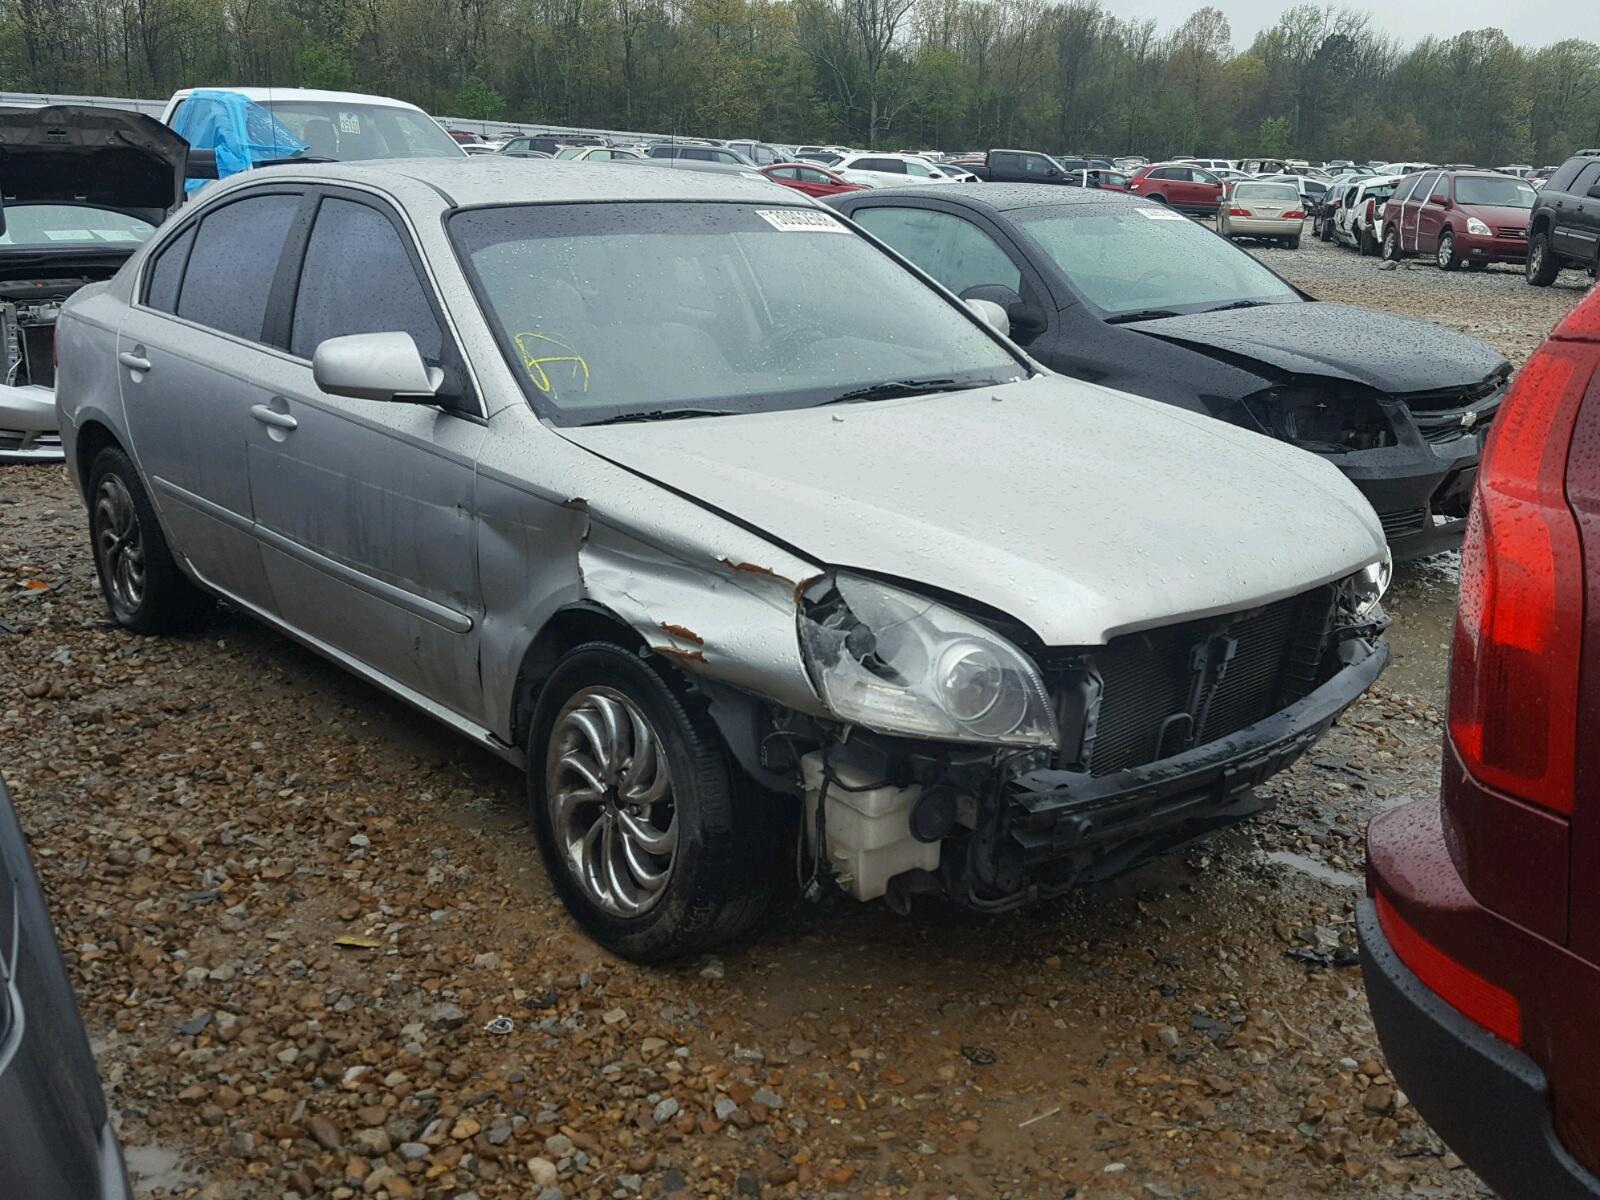 cert carfinder sale view on online copart auto baton la kia white salvage title en optima rouge in lot lx of left auctions